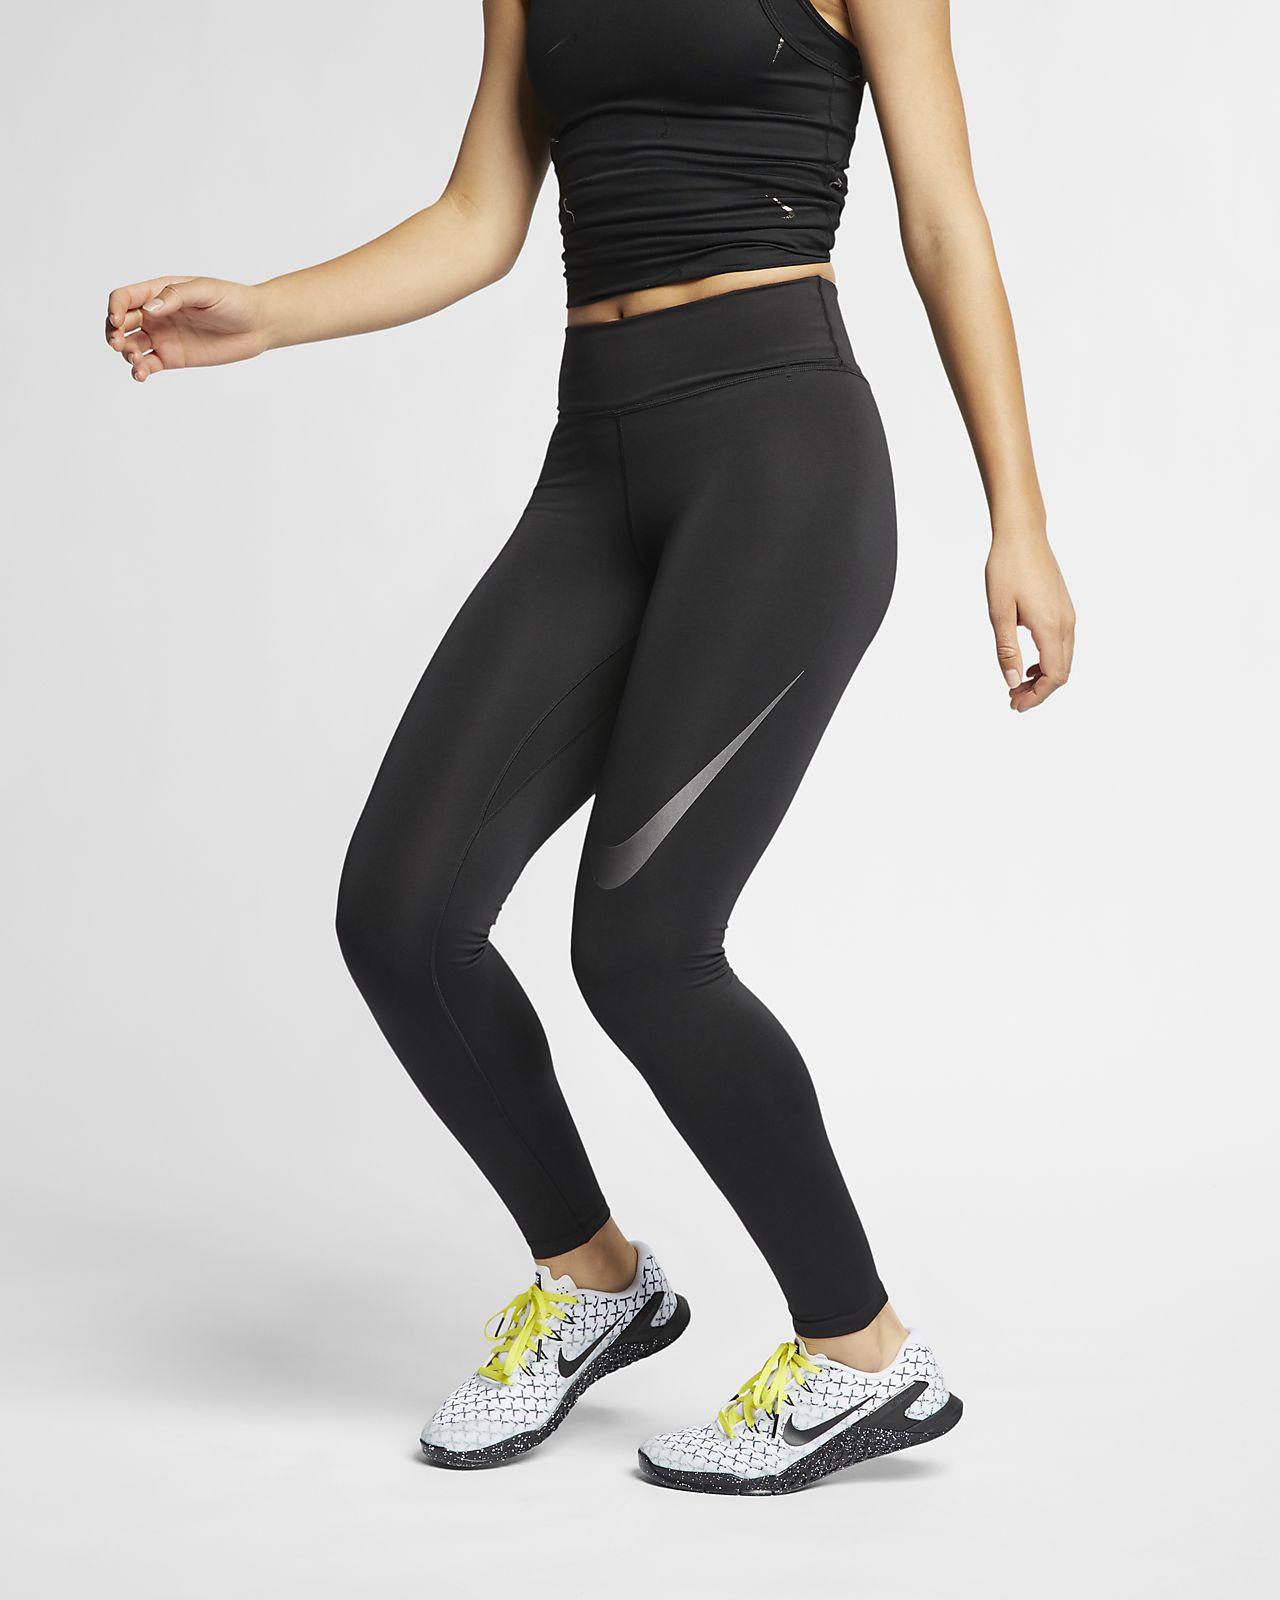 Nike One 女子训练紧身裤